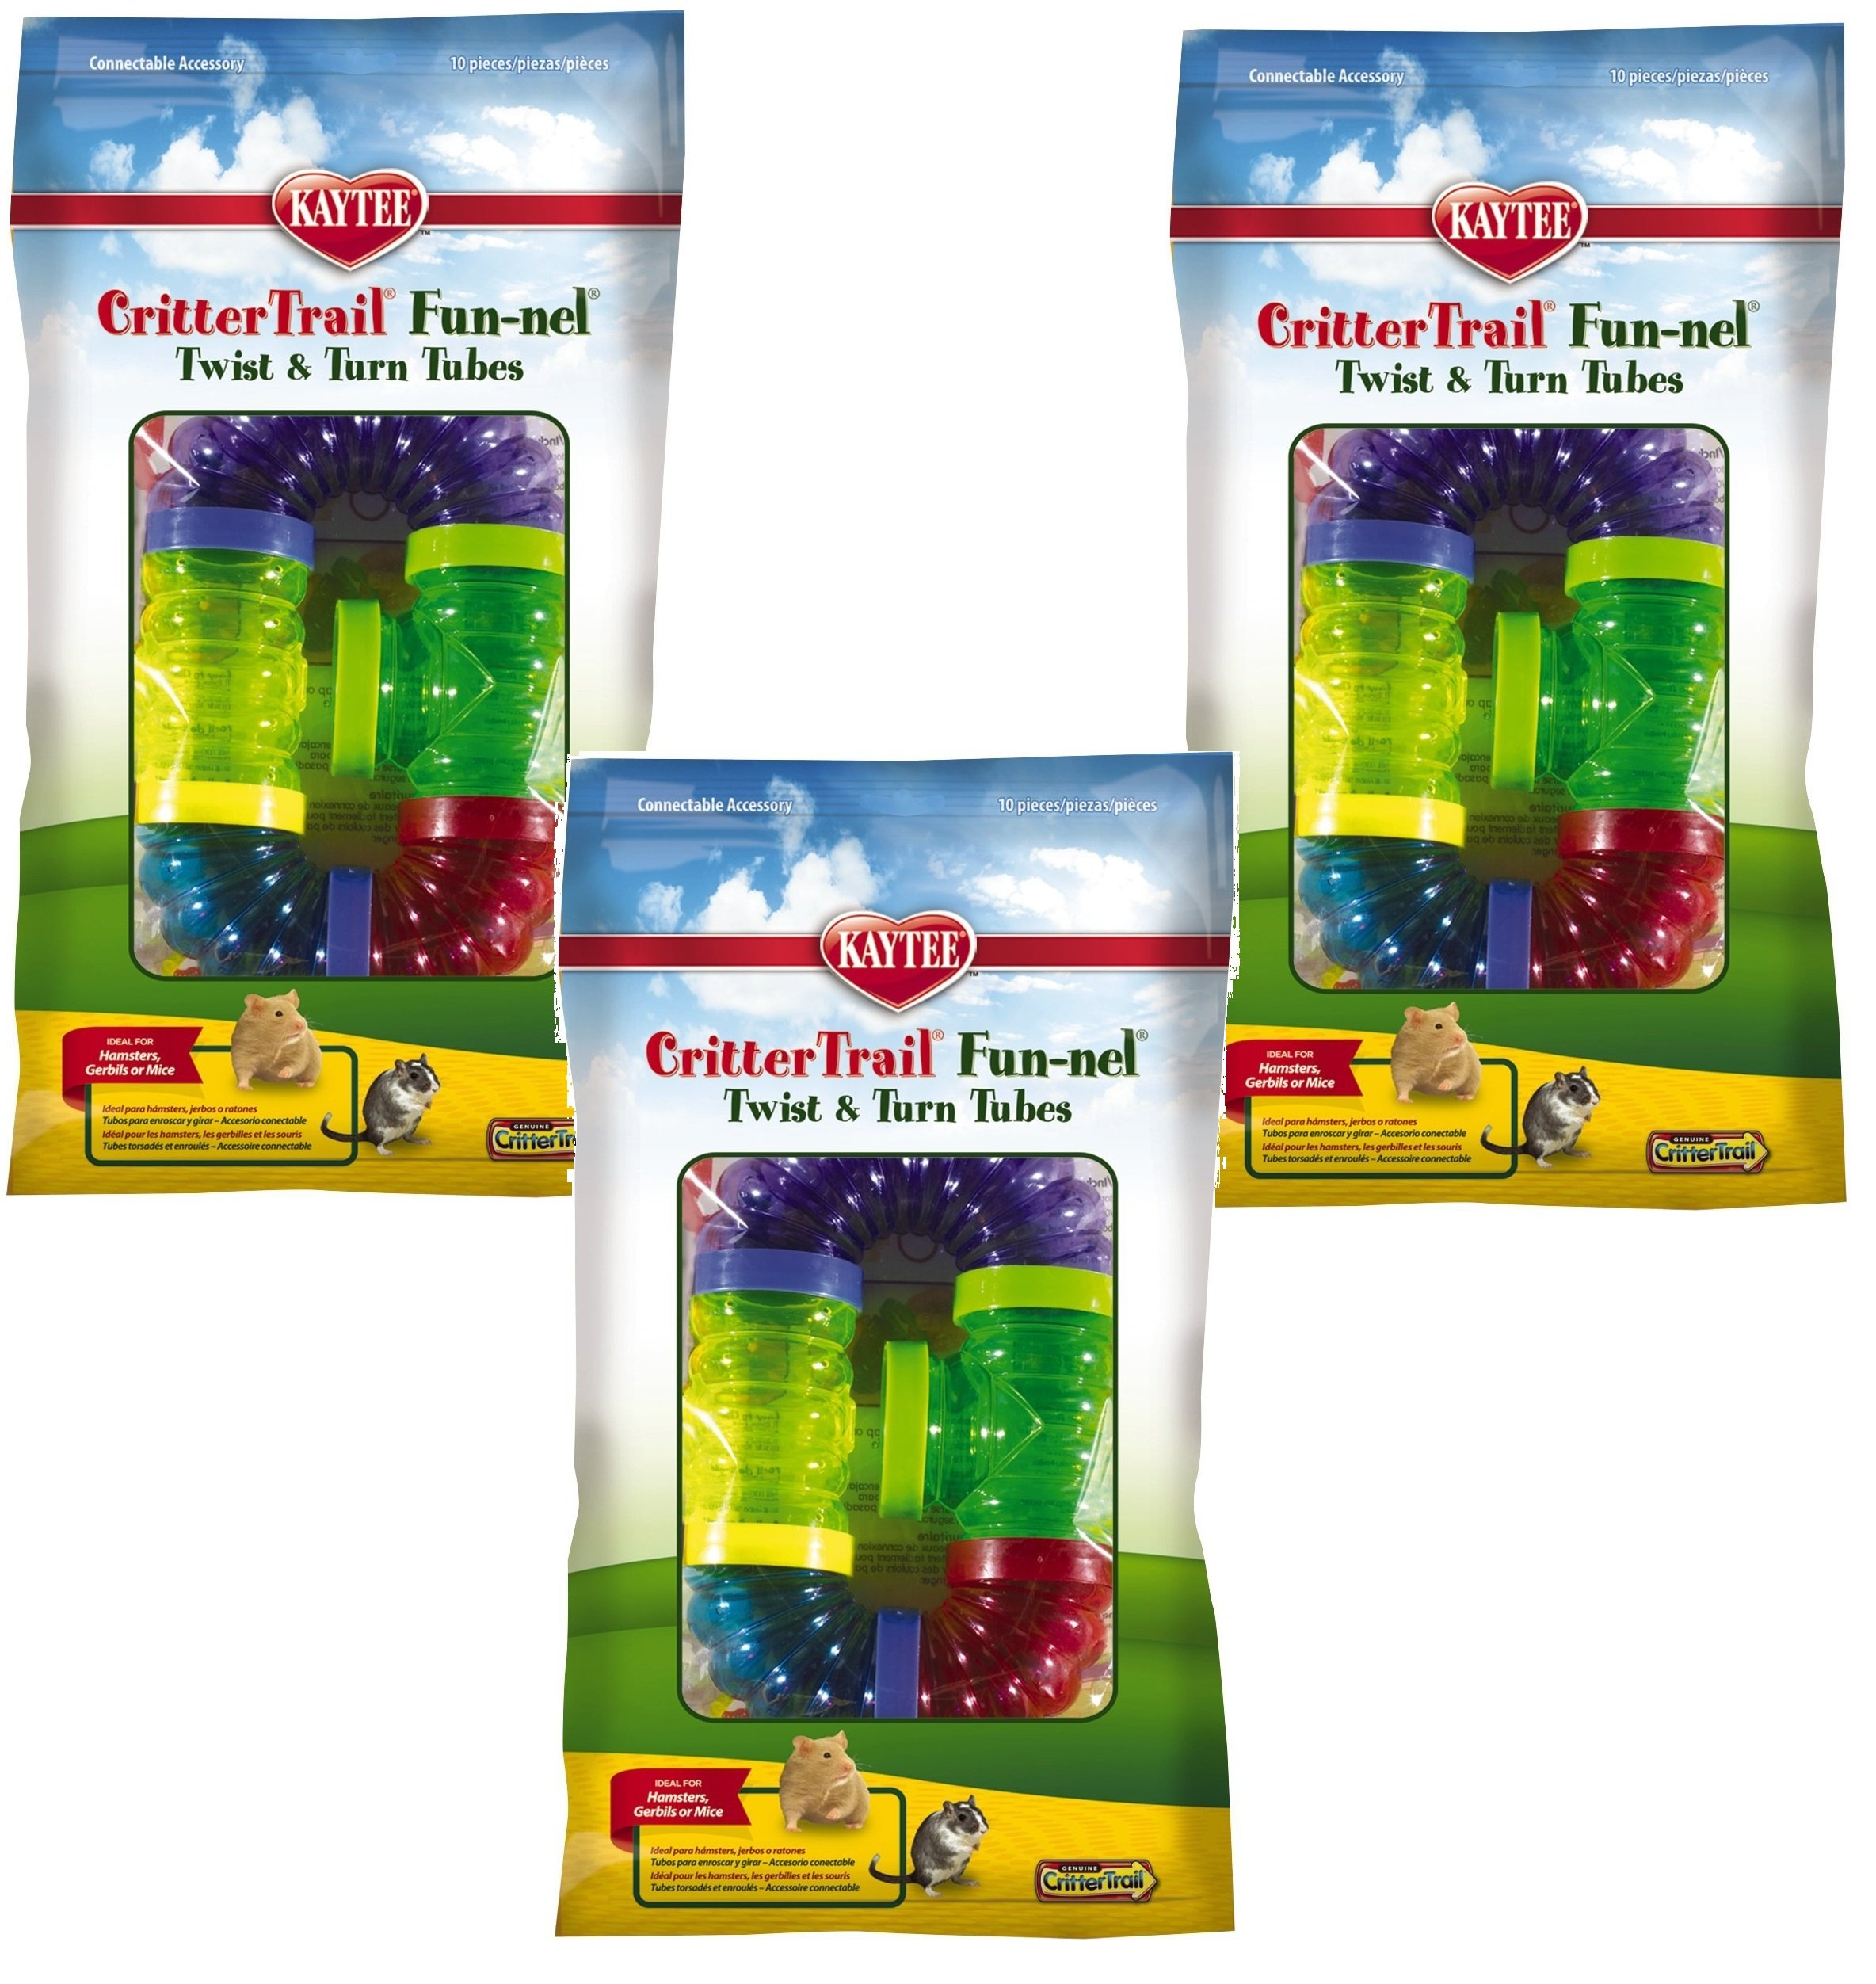 (3 Packages) Kaytee CritterTrail Fun Twist and Turn Value Pack, Colors Vary by Kaytee